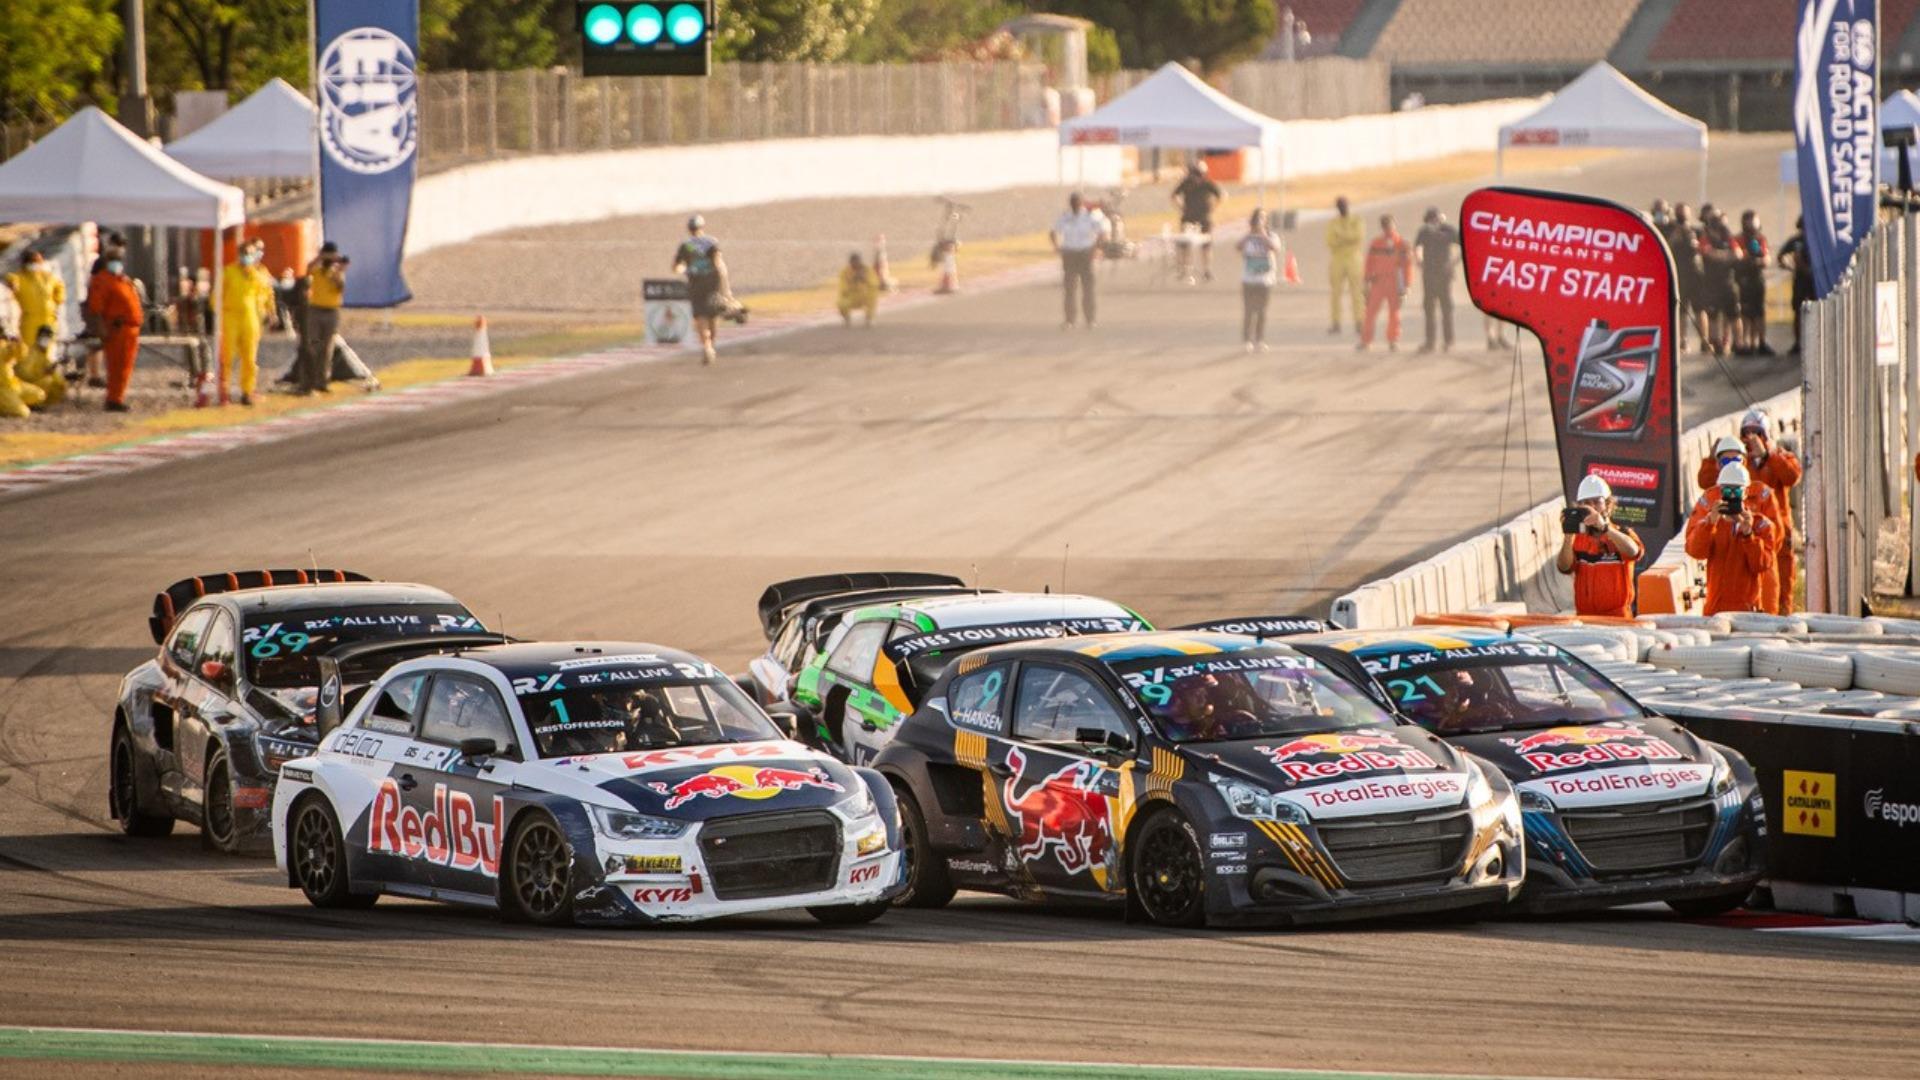 World RX of Catalunya 2021: World RX Final